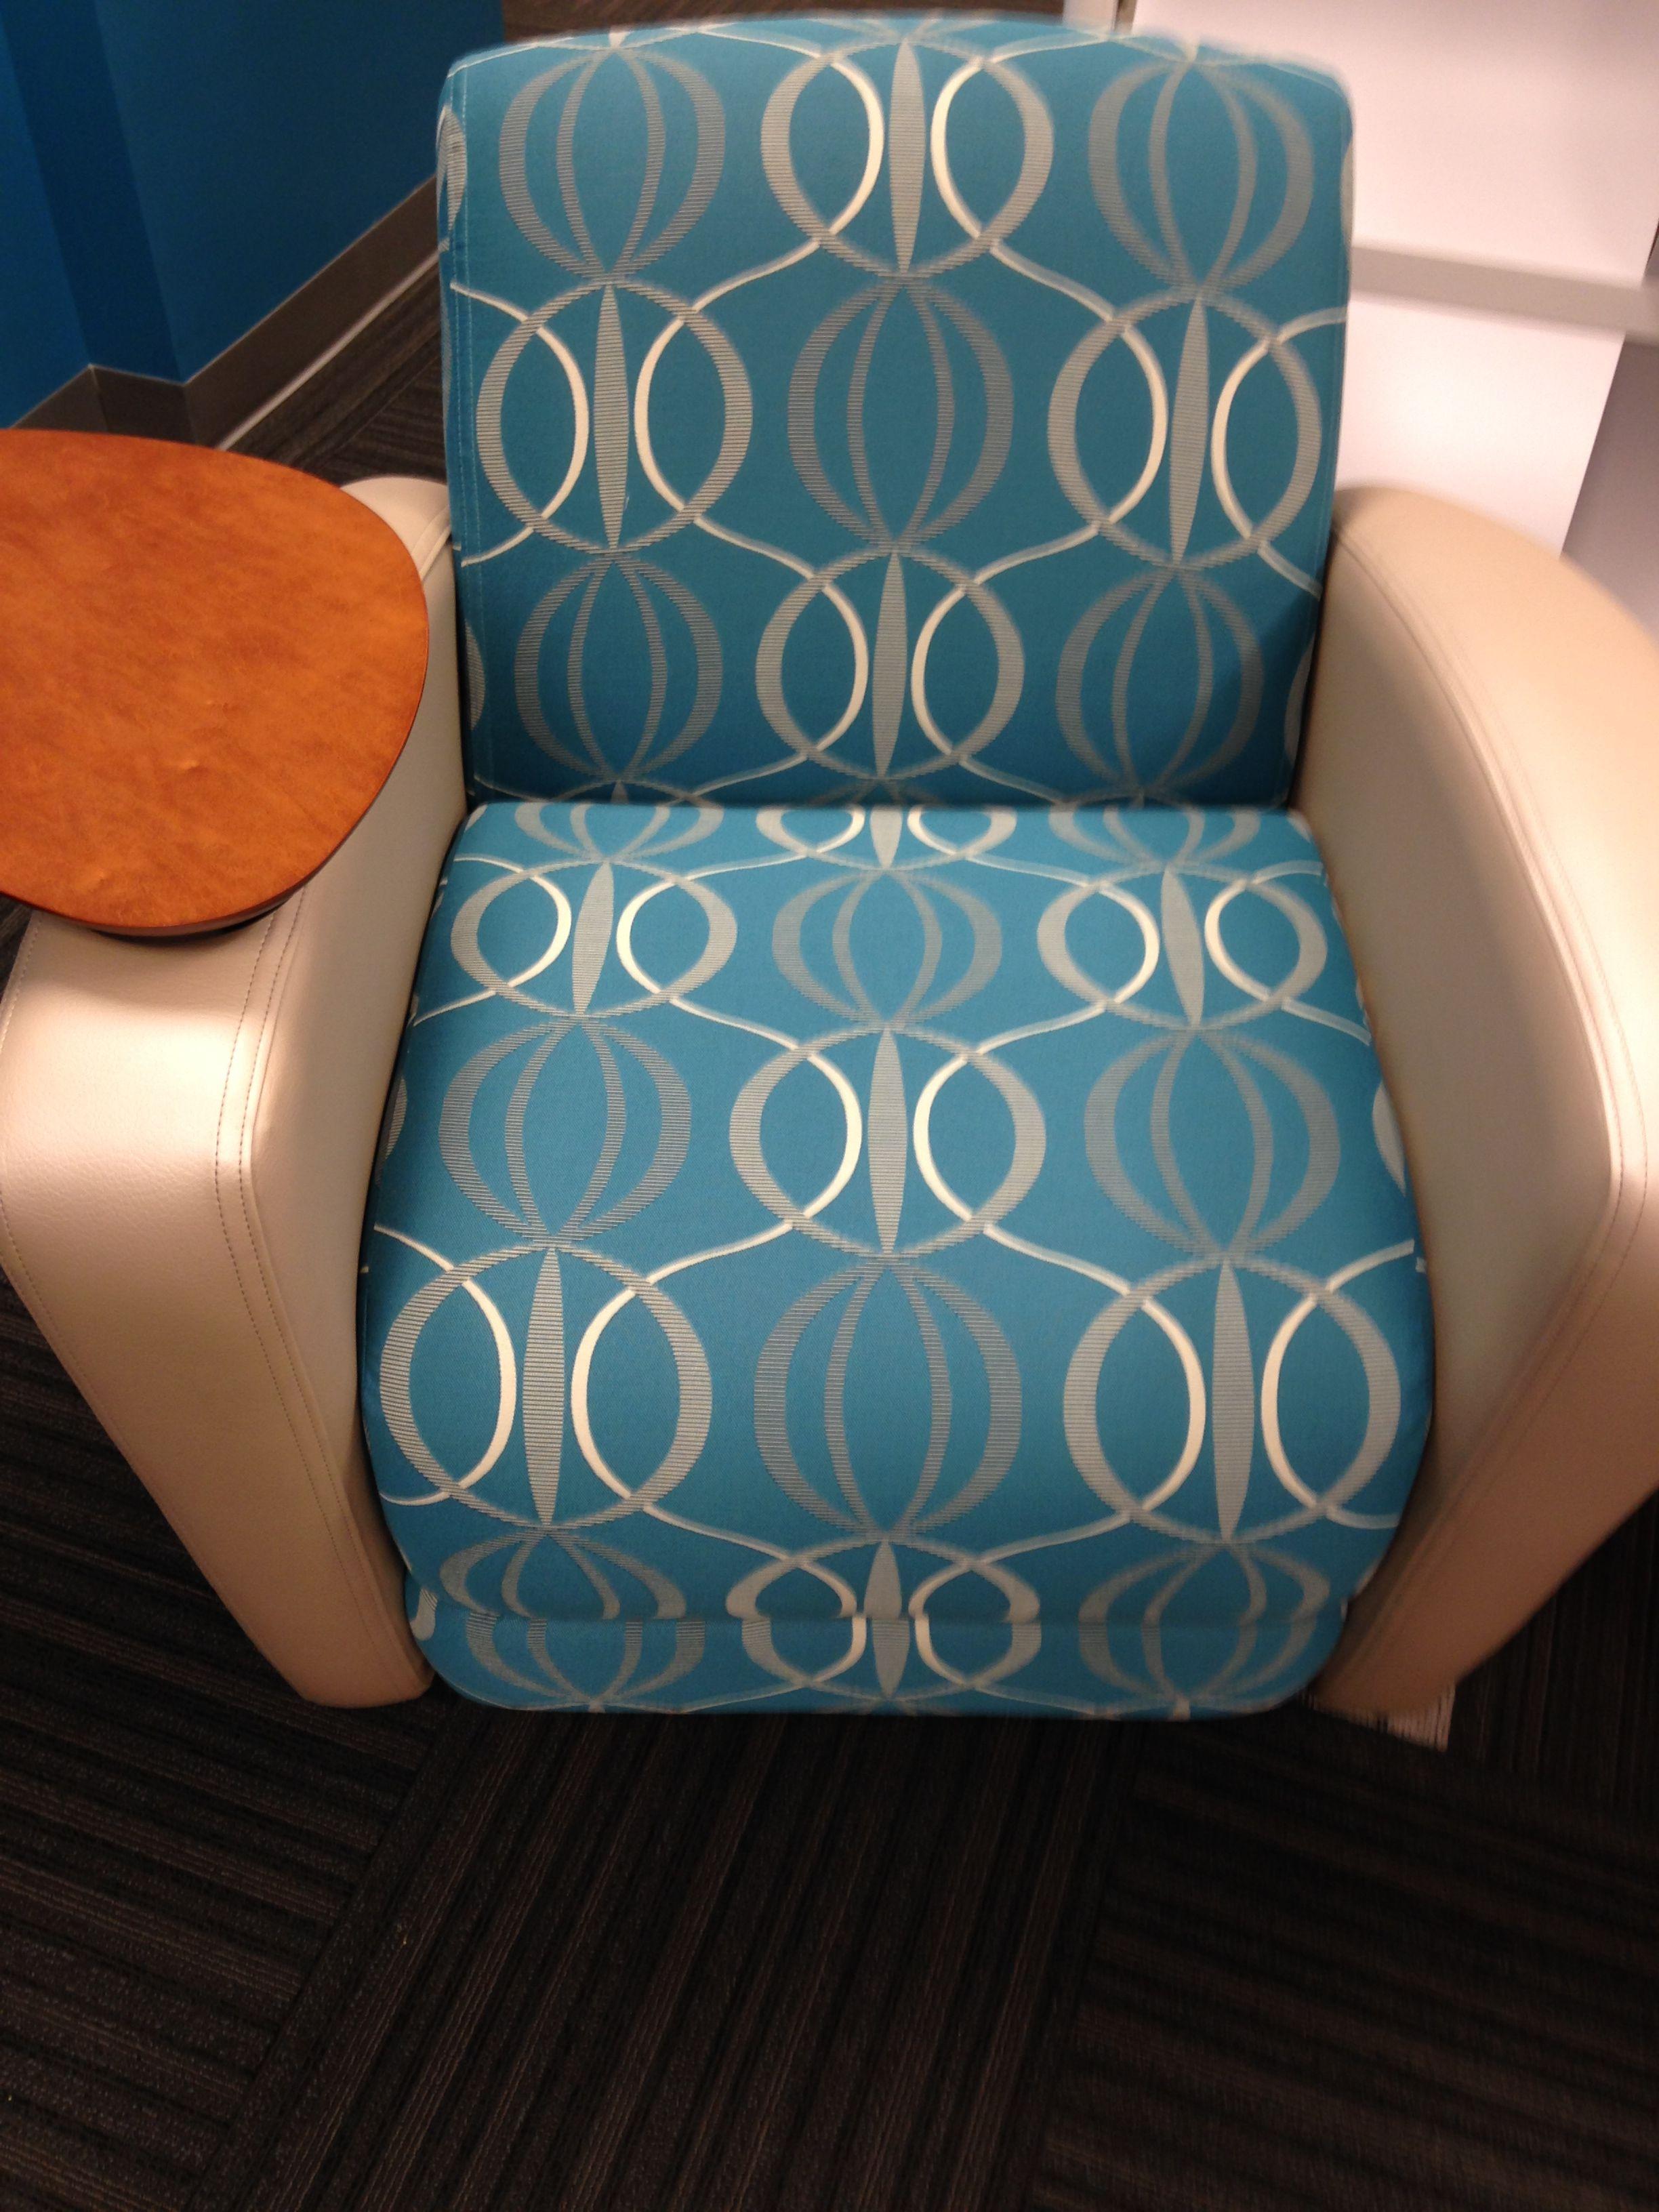 Arc-Com: Spyro Large scale geometric print blue upholstery fabric on National Office Furniture's Reno lounge chair. www.arc-com.com